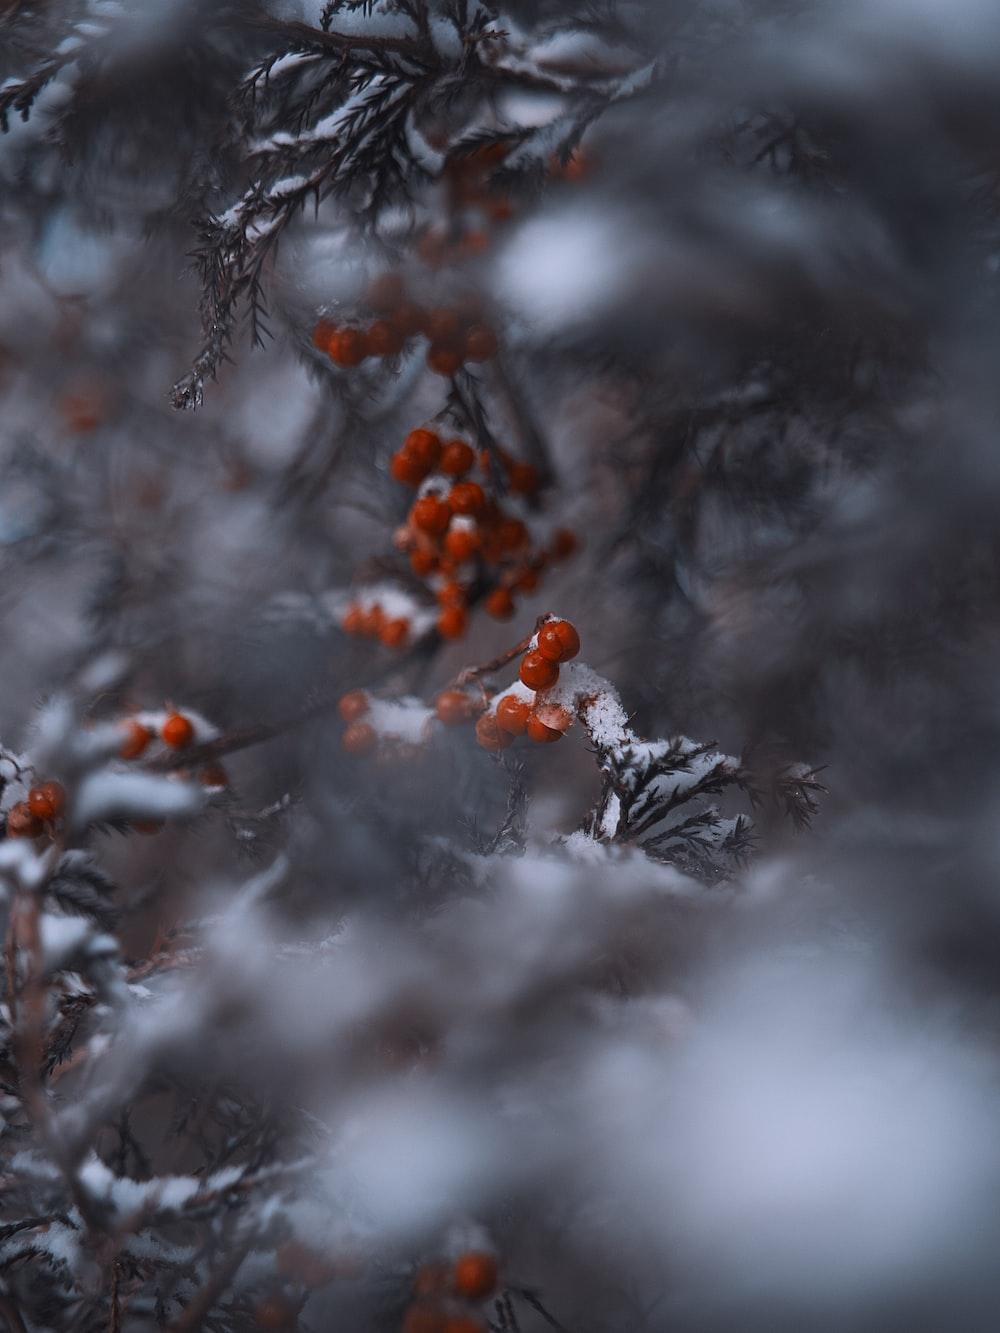 snow-covered red mistletoe